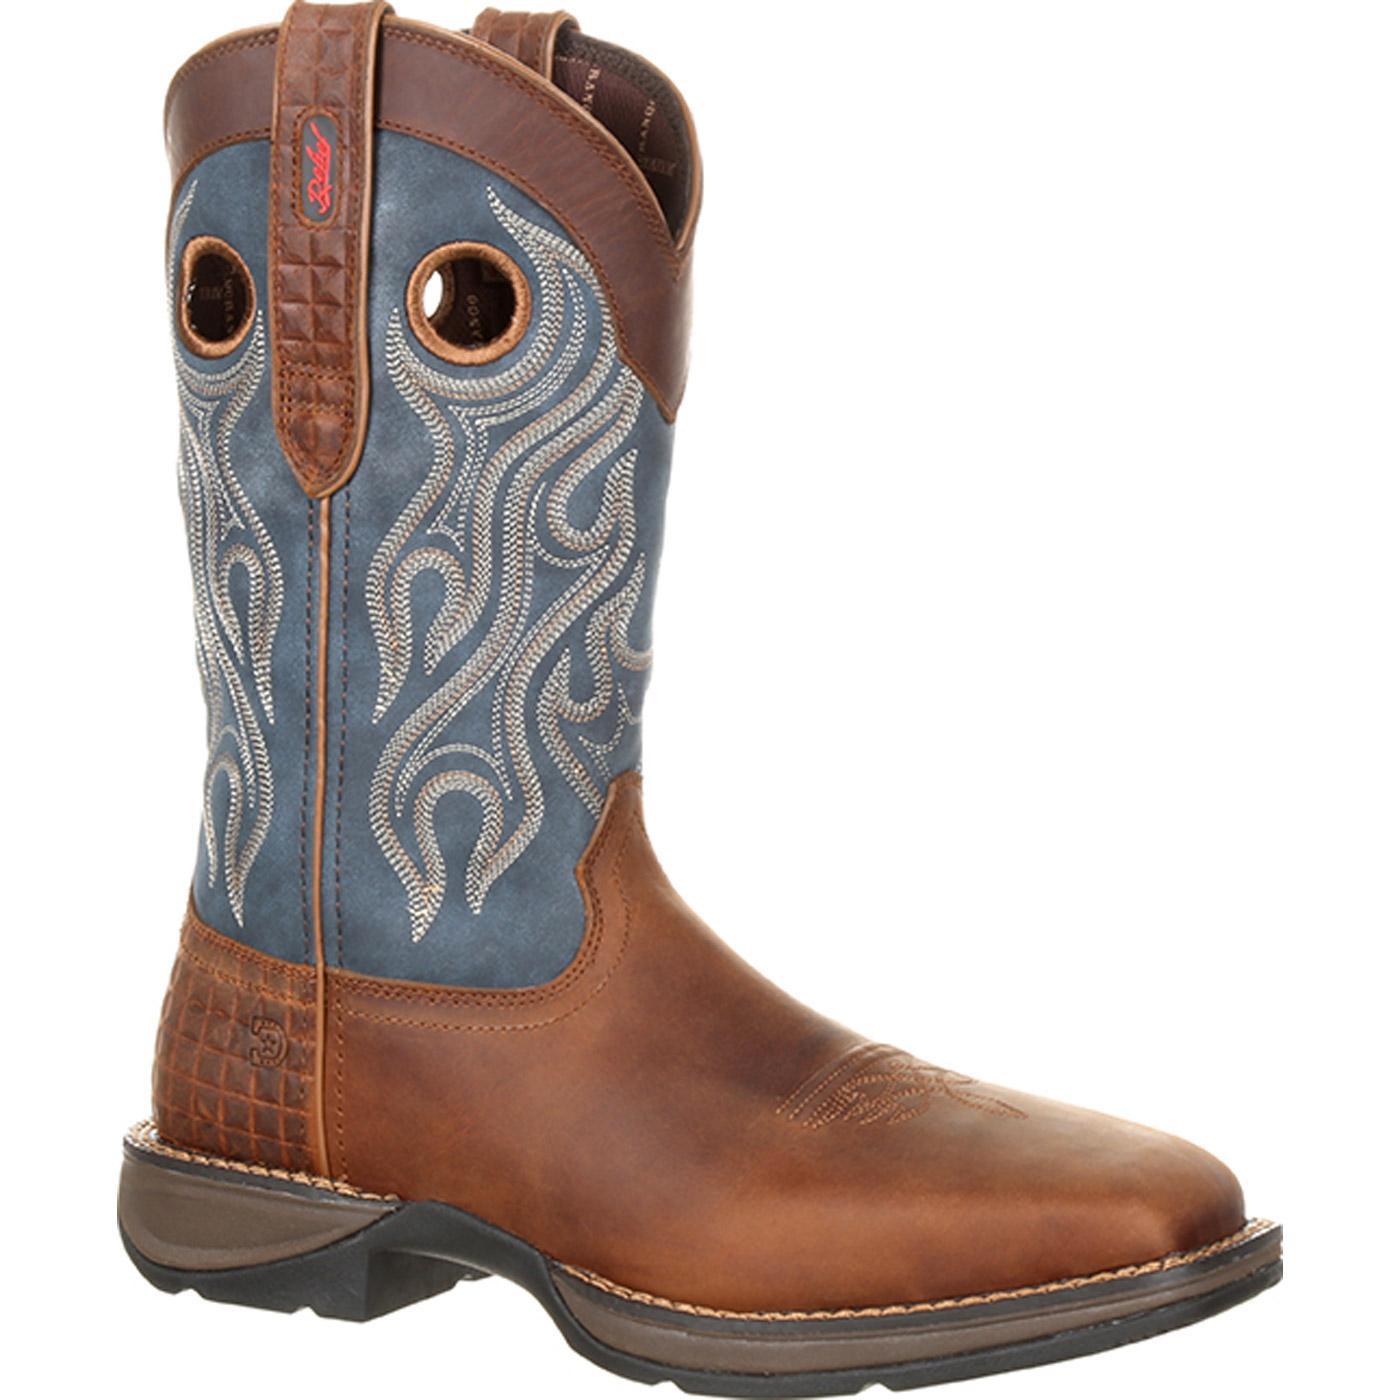 b442ef13b08 Rebel by Durango Steel Toe Pull-on Western Boot